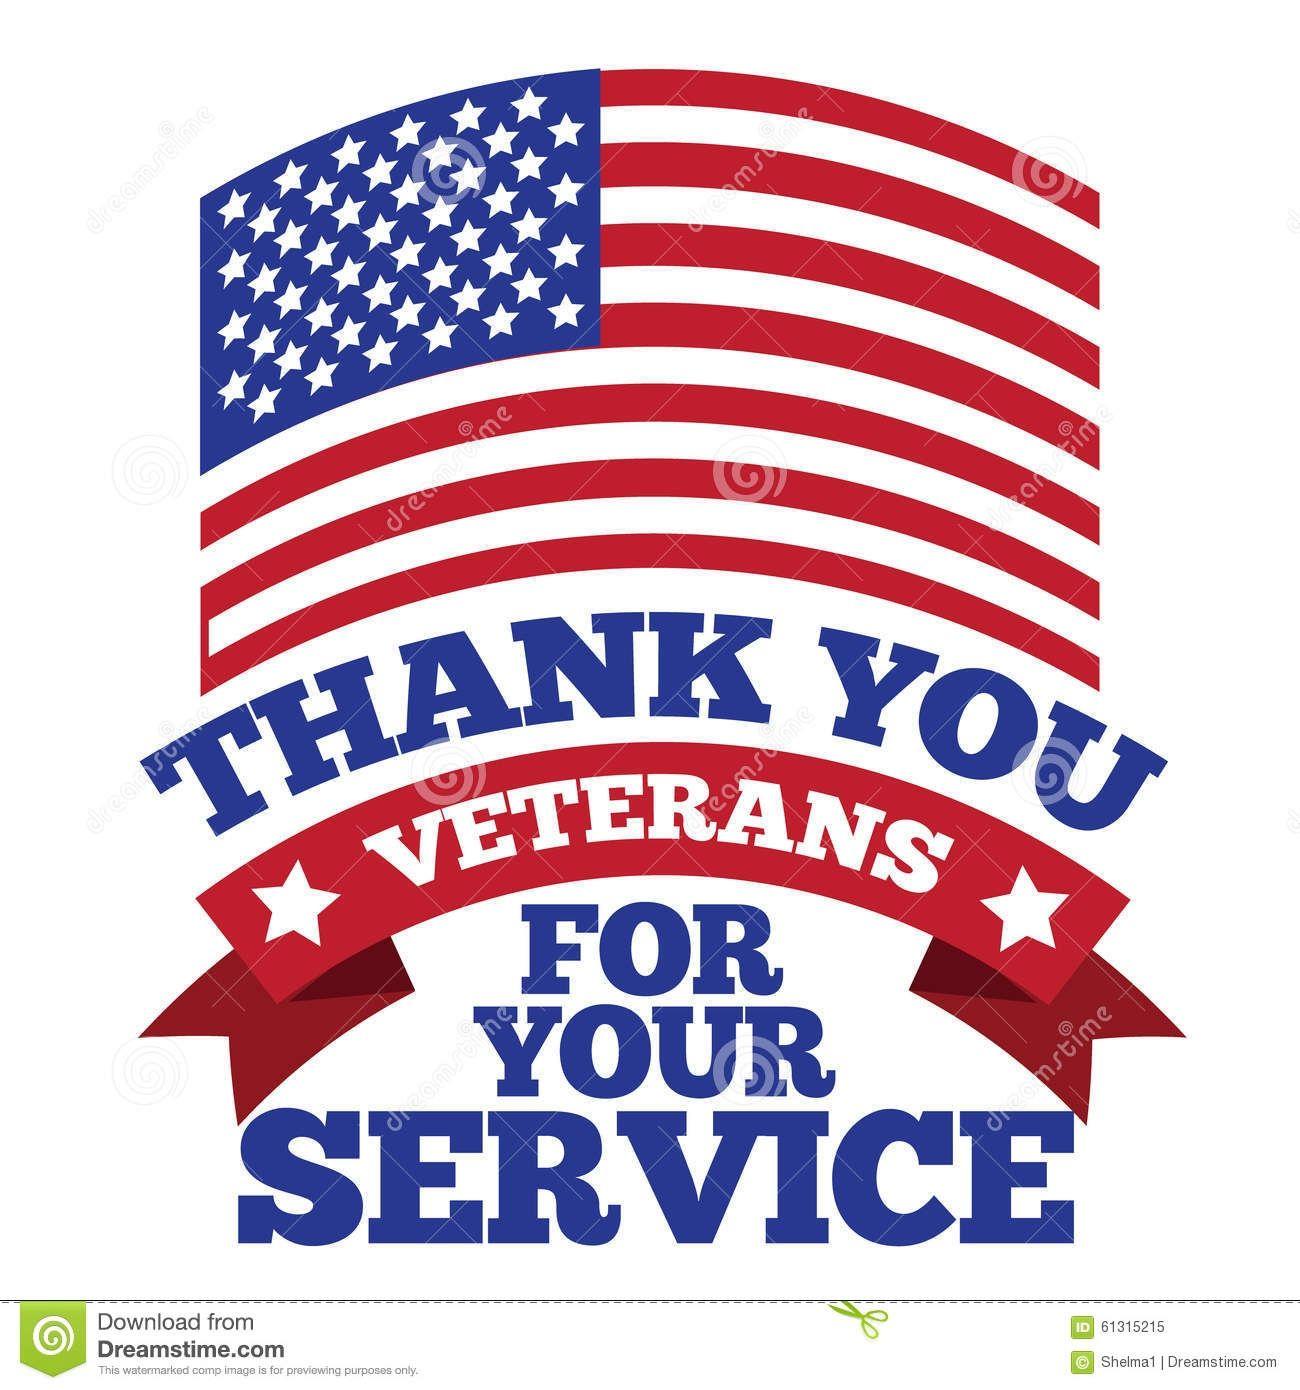 veterans day clip art.